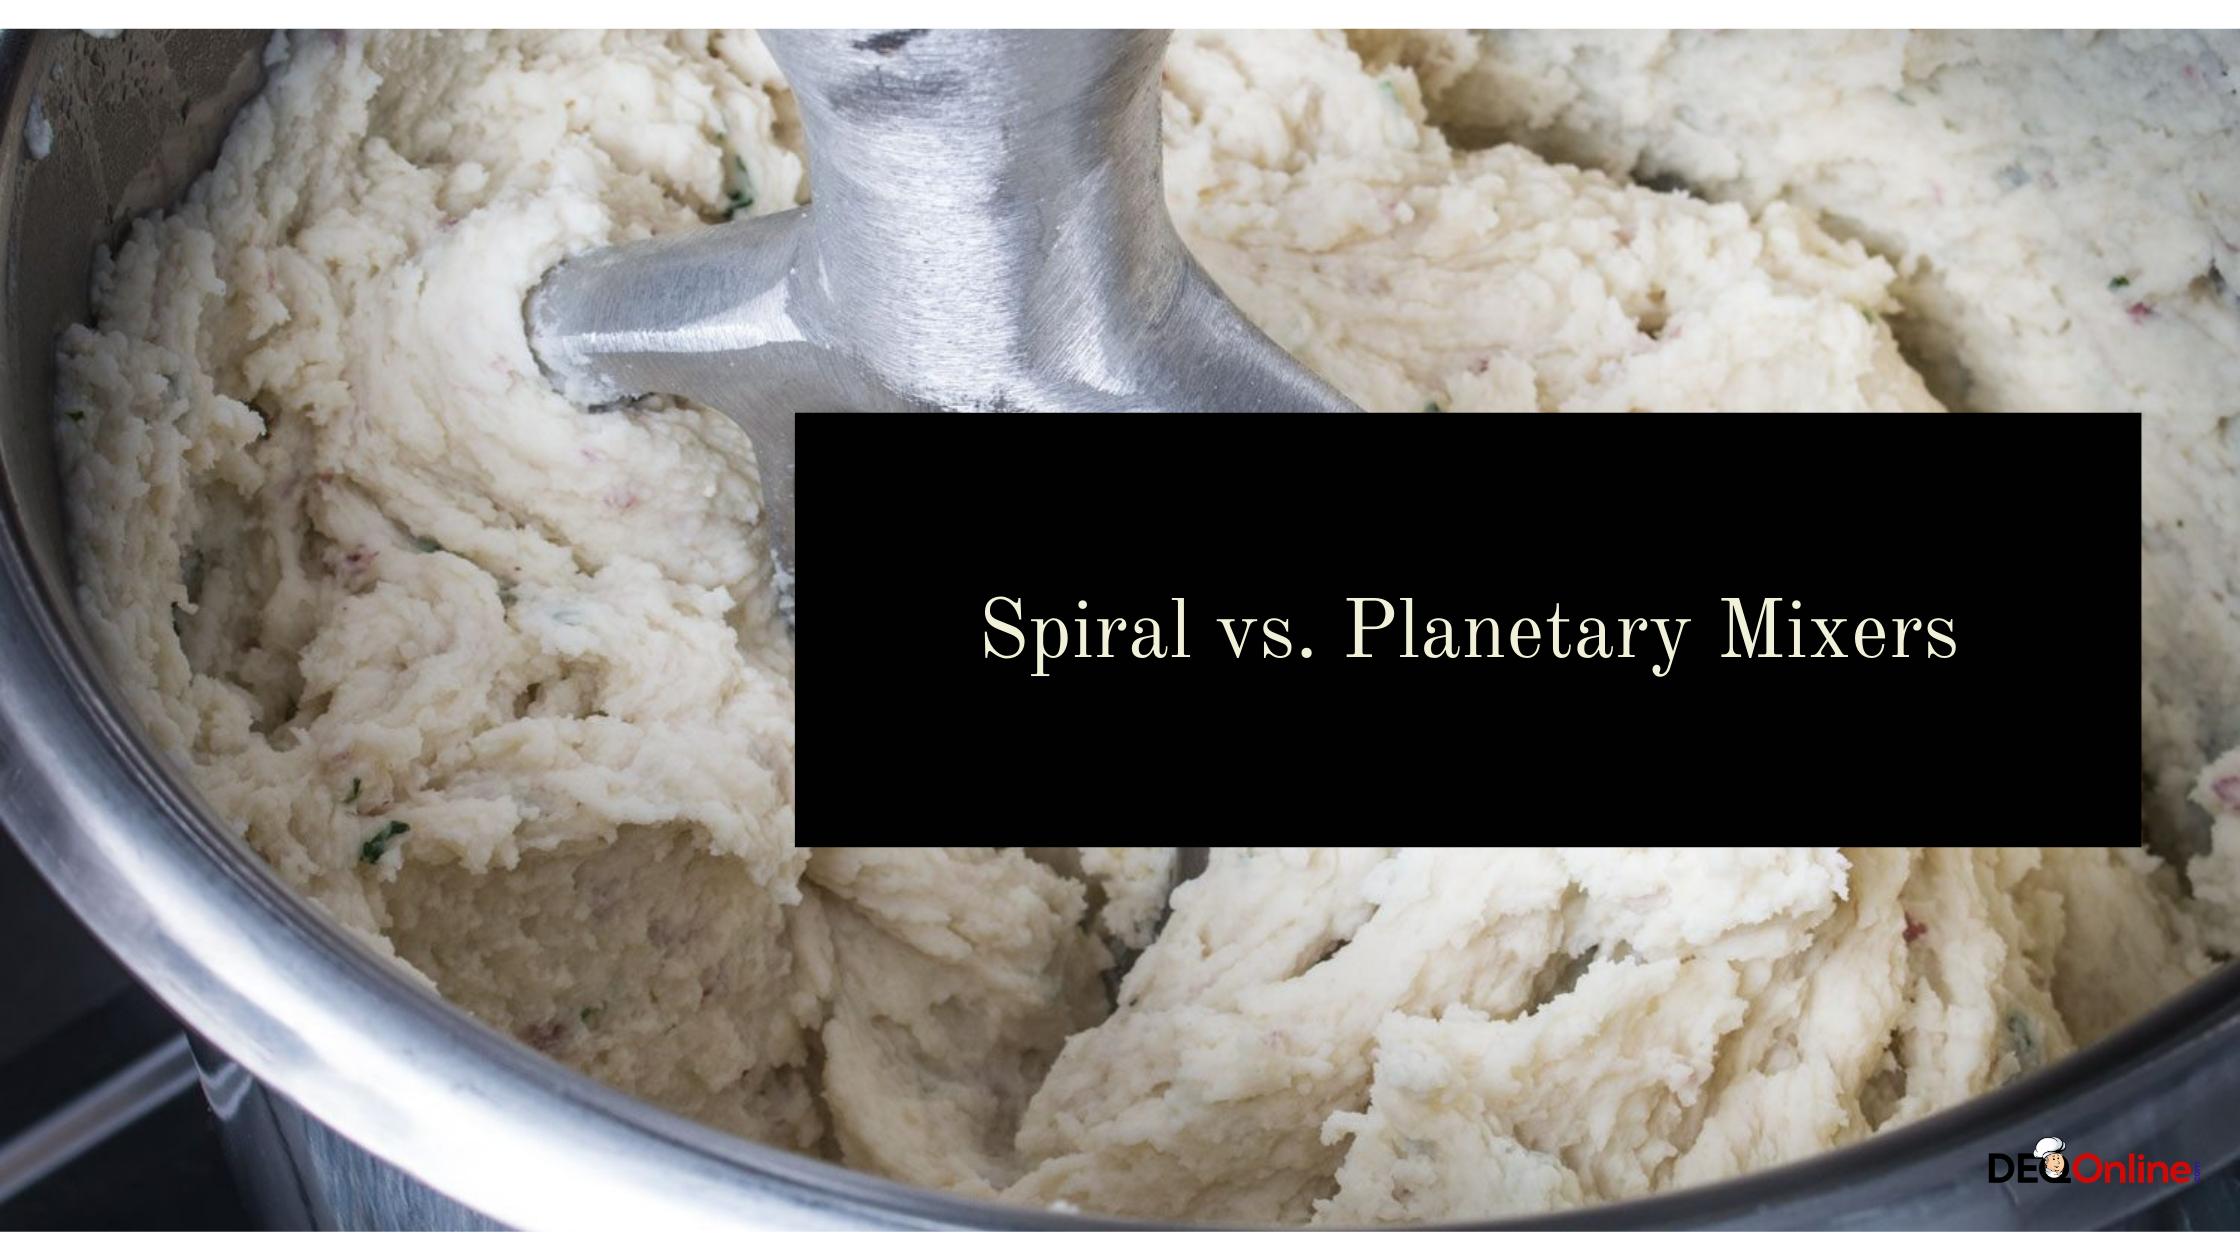 Spiral vs. Planetary Mixers